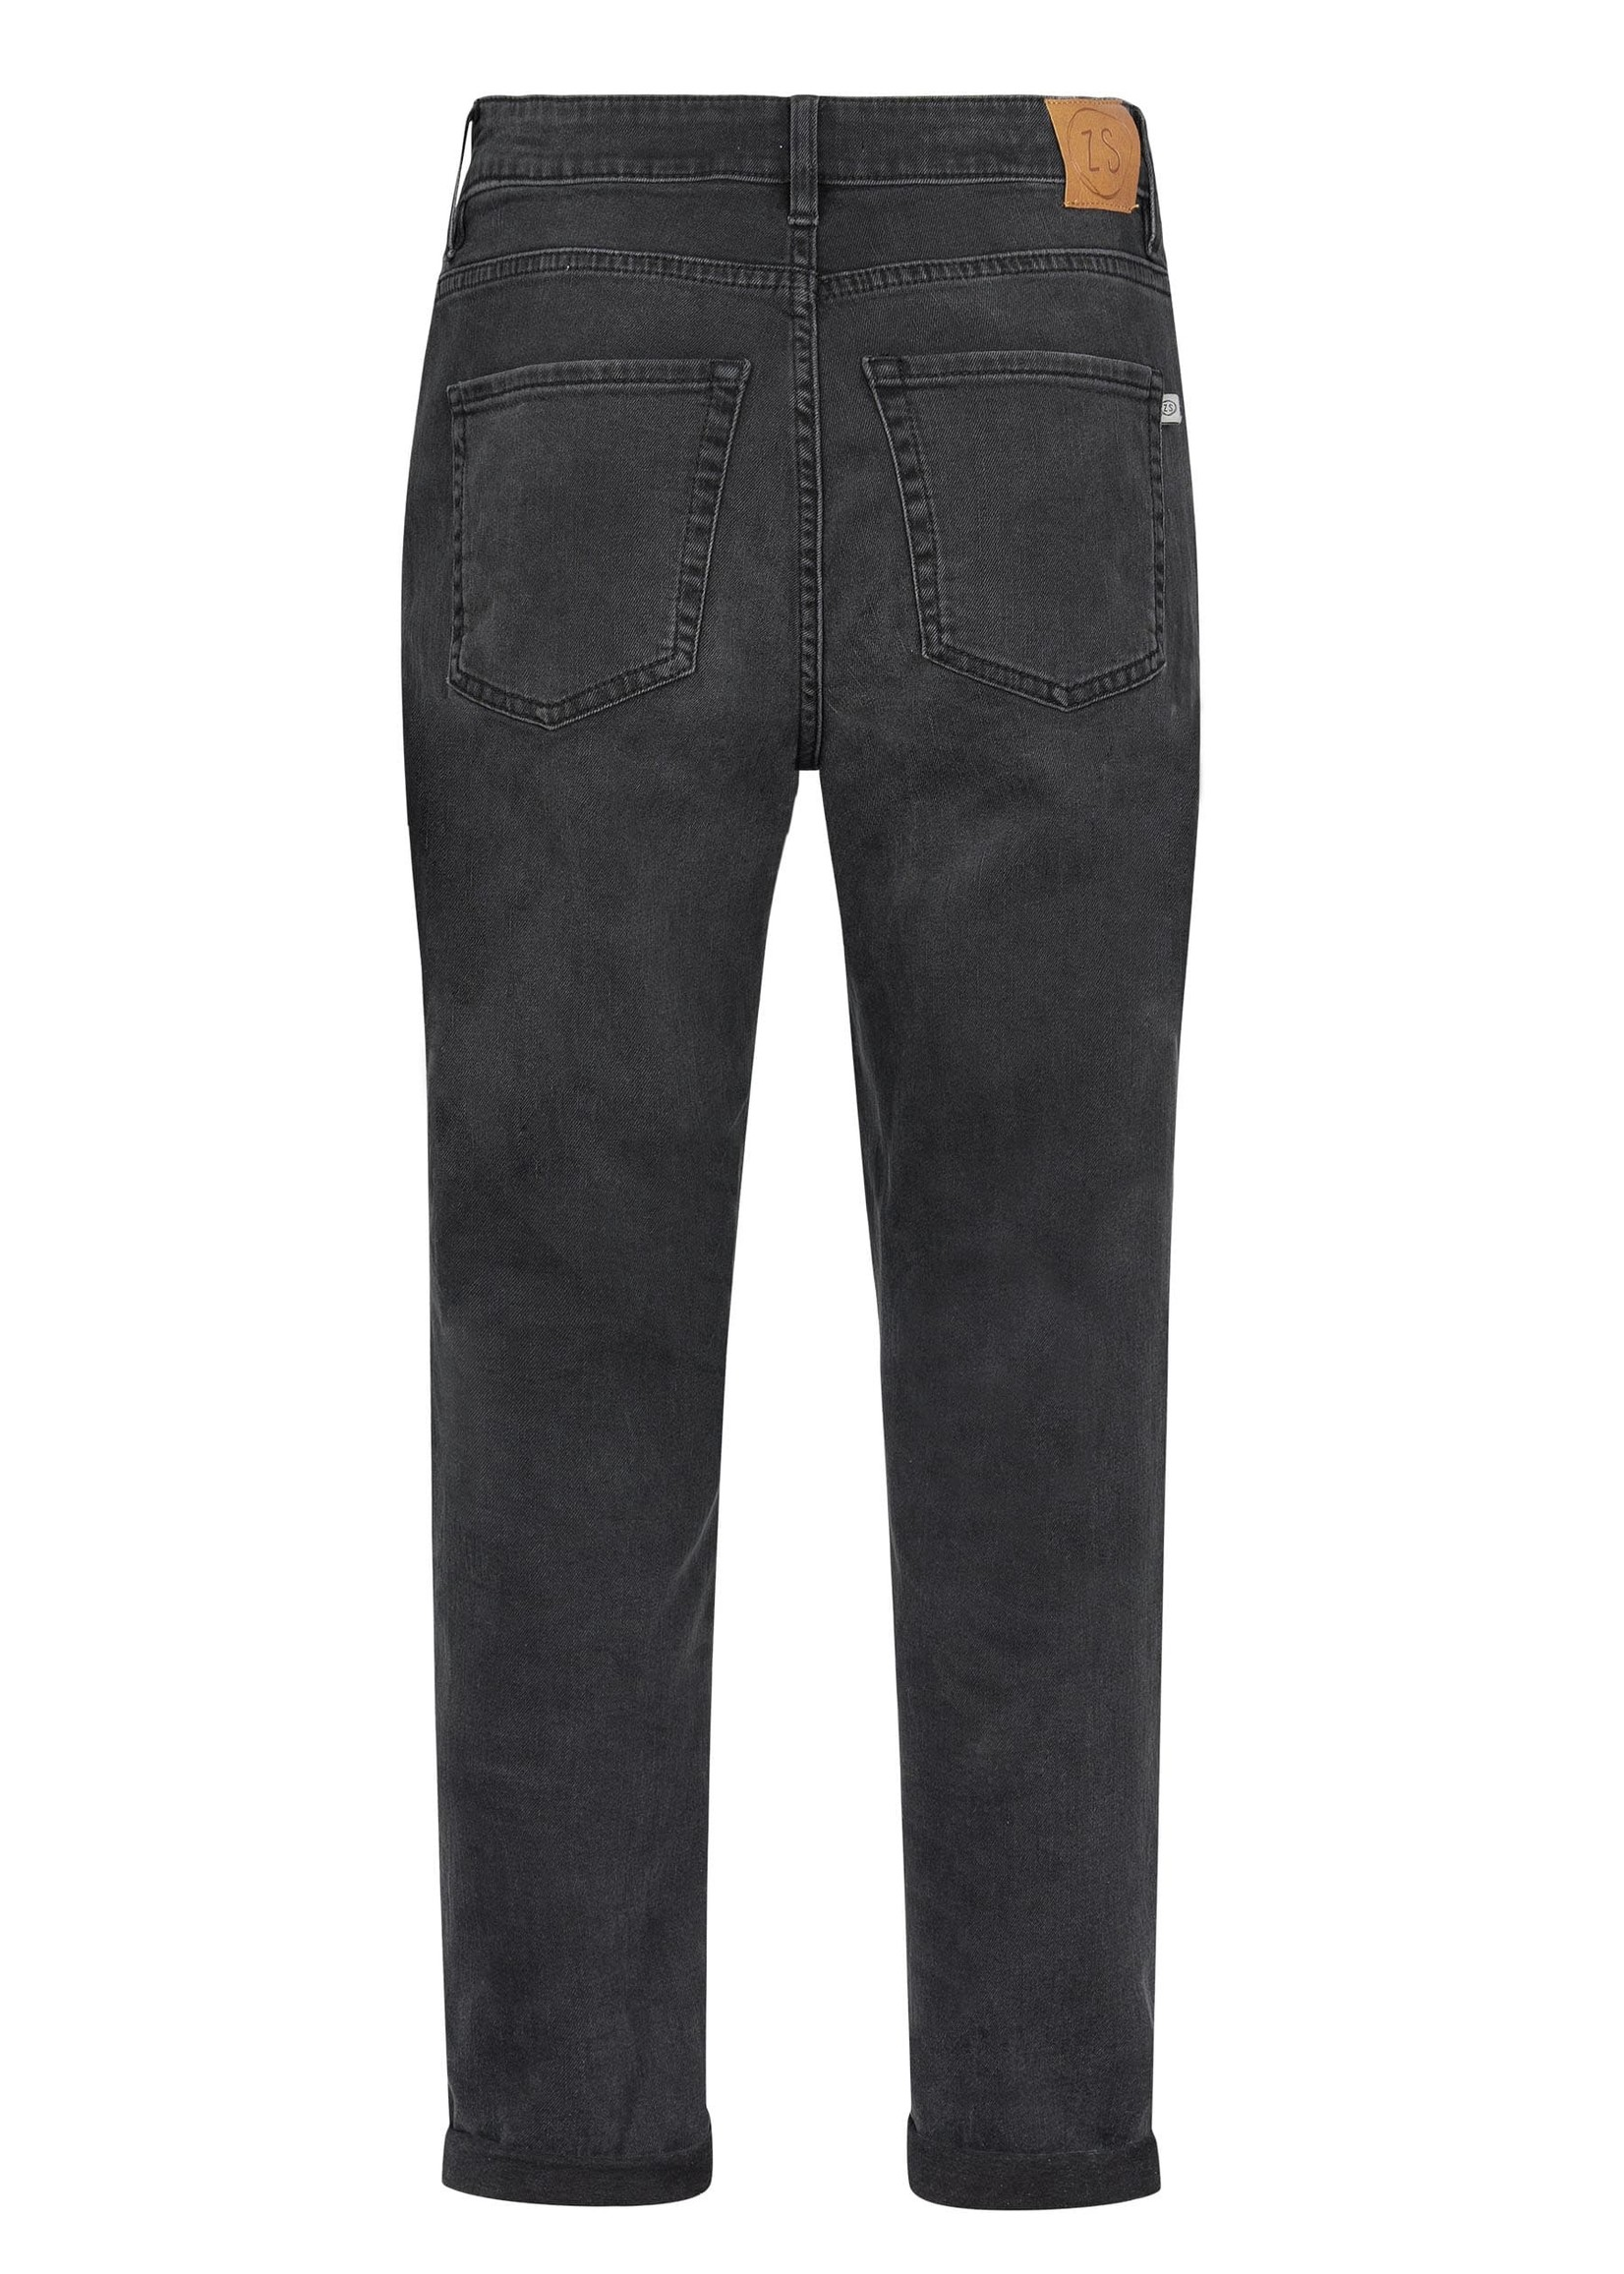 ZUSSS mom jeans off black